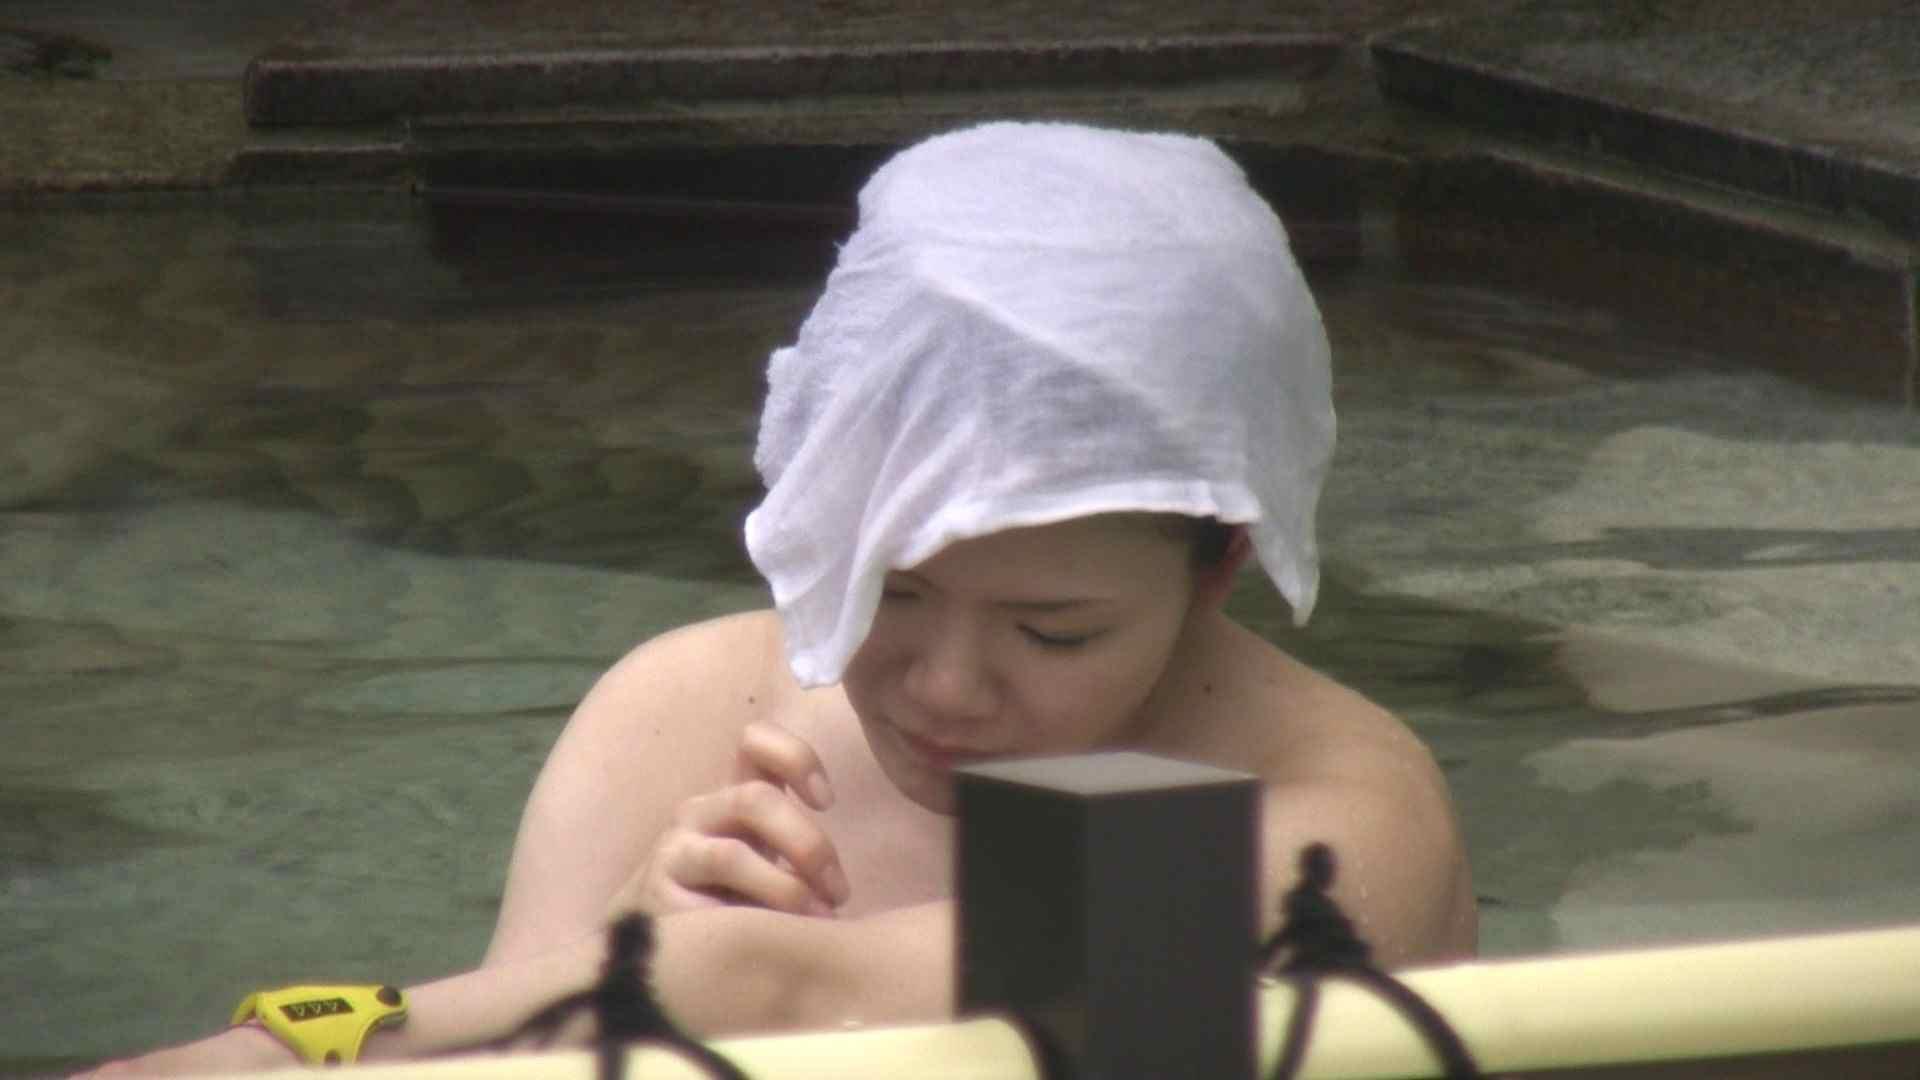 Aquaな露天風呂Vol.12【VIP】 HなOL | 盗撮  83pic 64